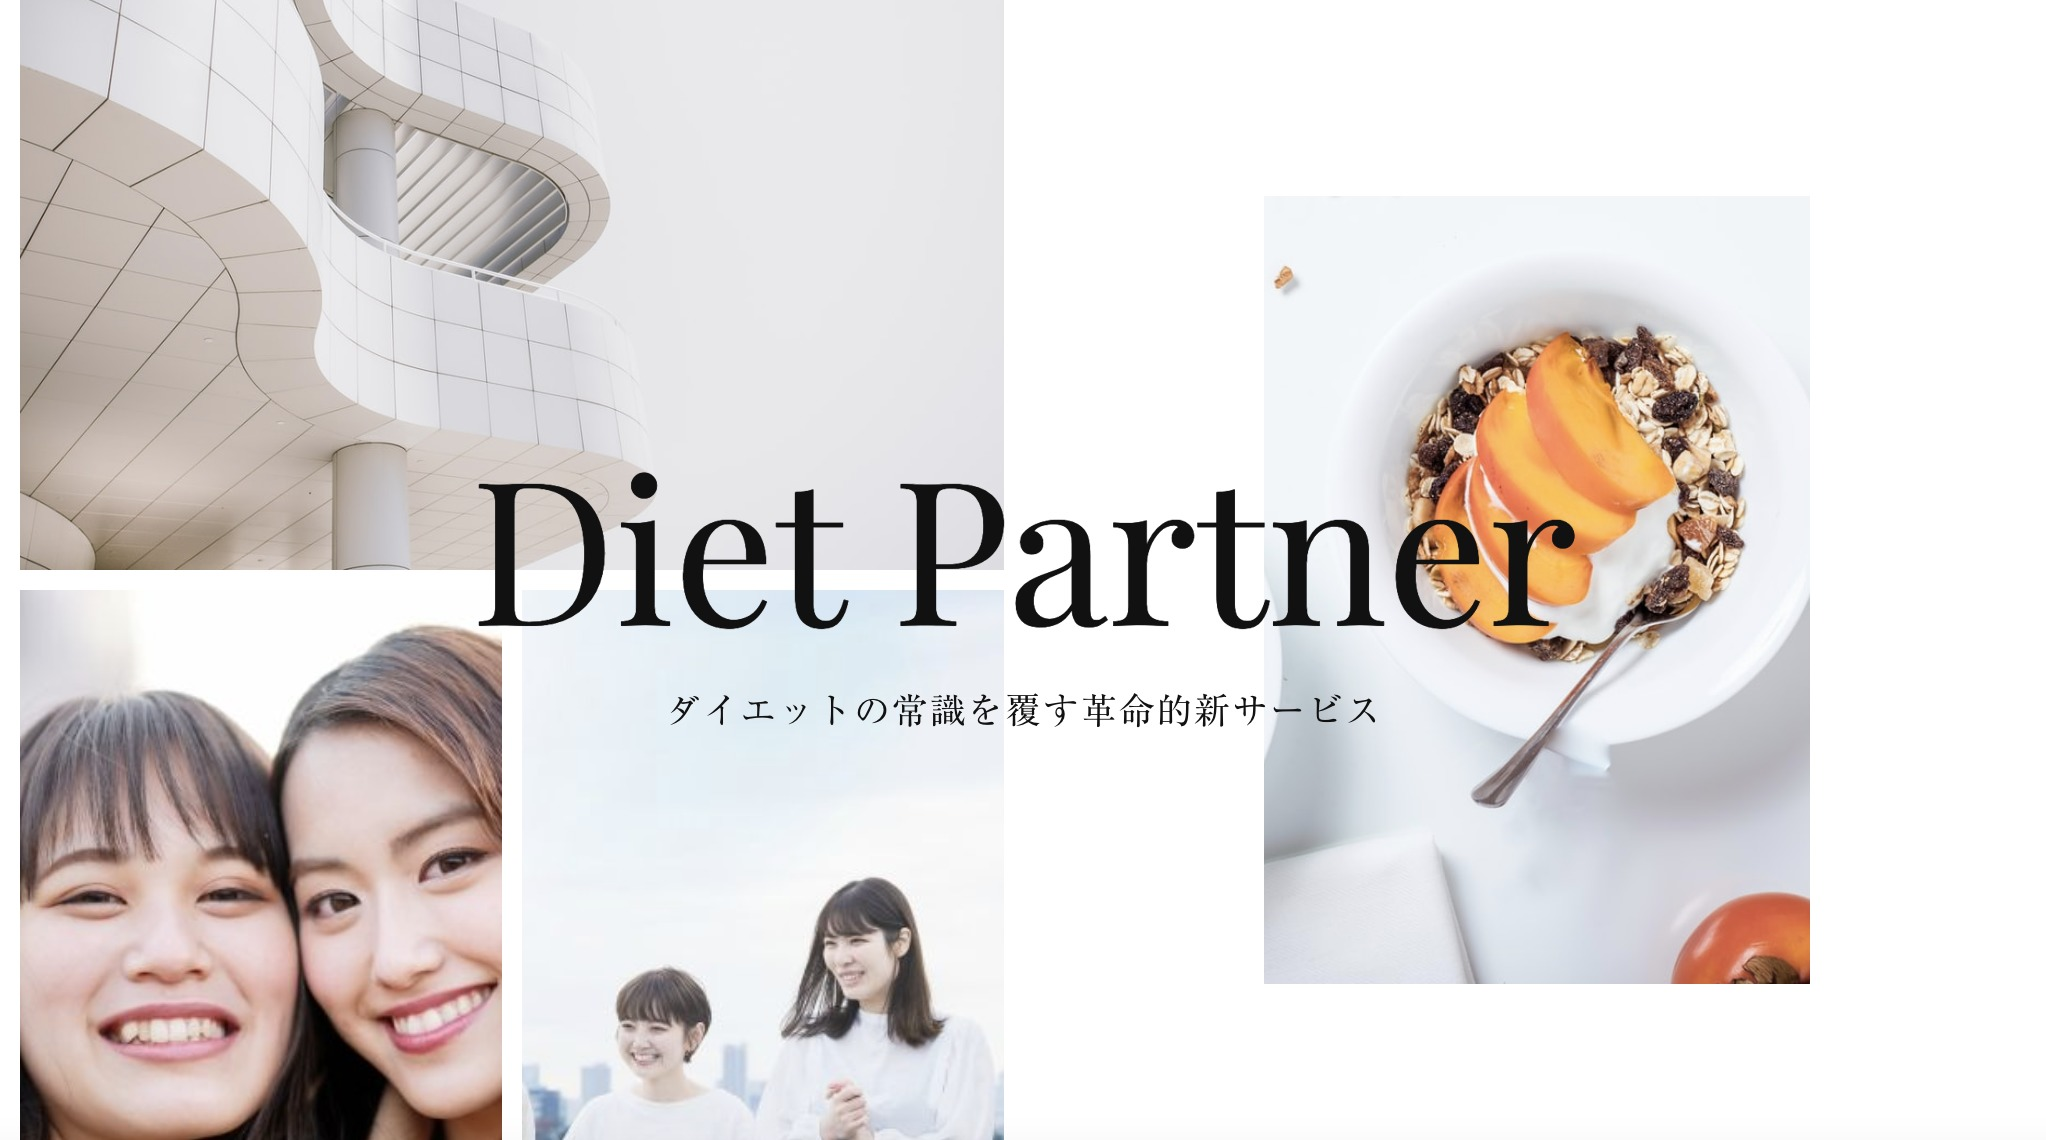 dietpartner.phpの画像